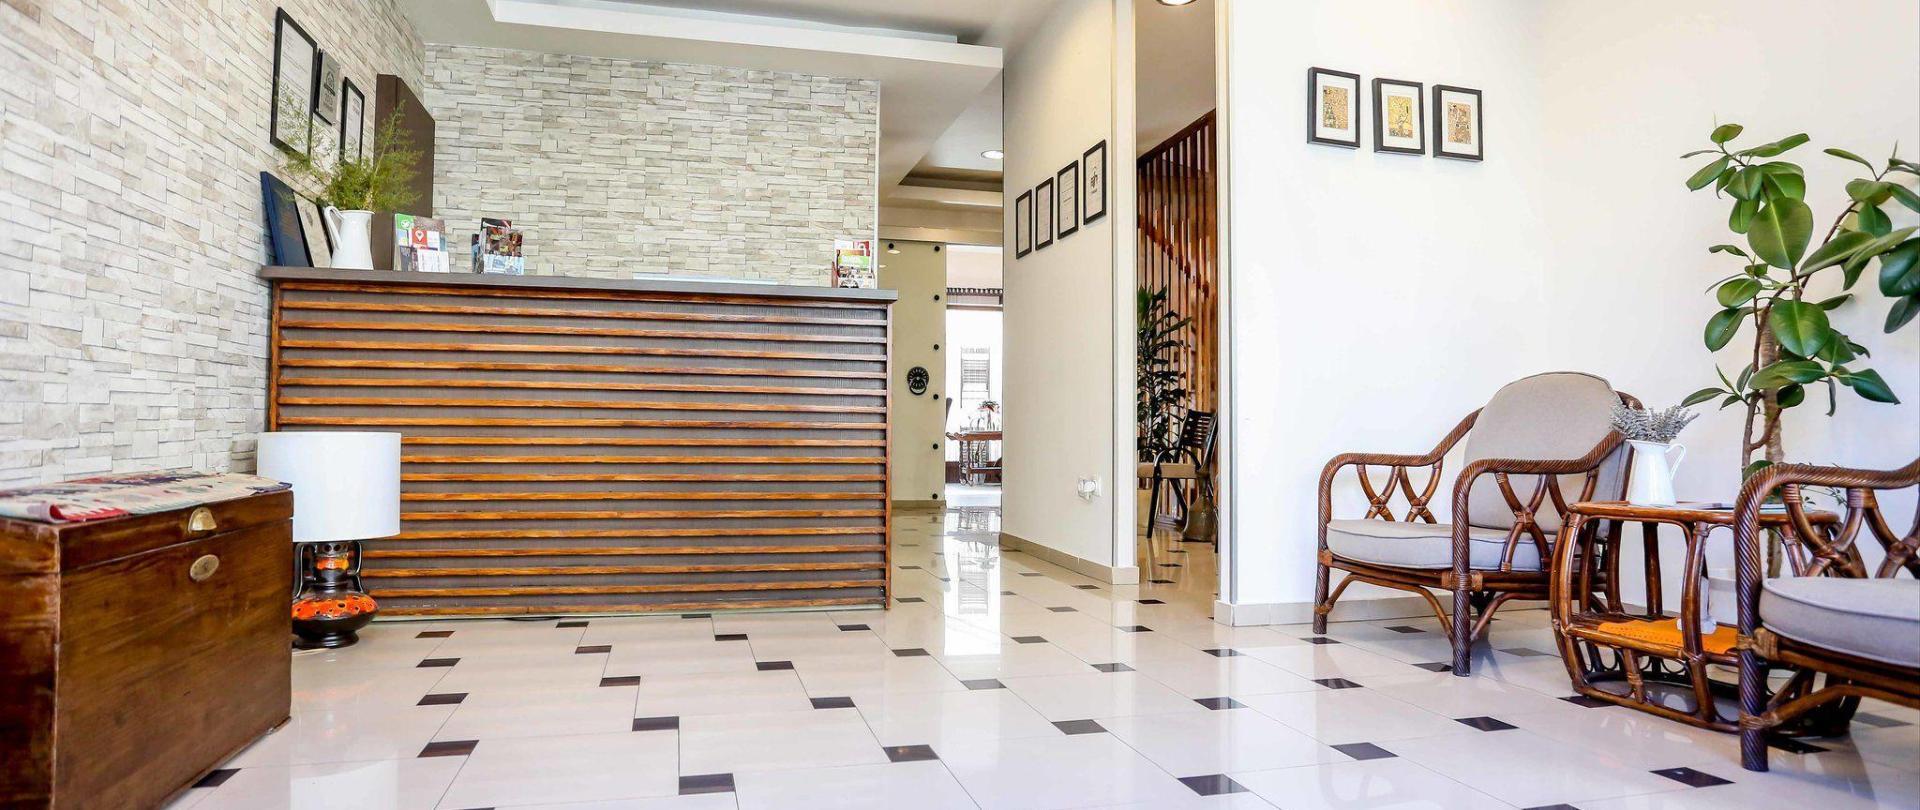 hotel-divan-by-dzenat-drekovic-29-08-2016-9.jpg